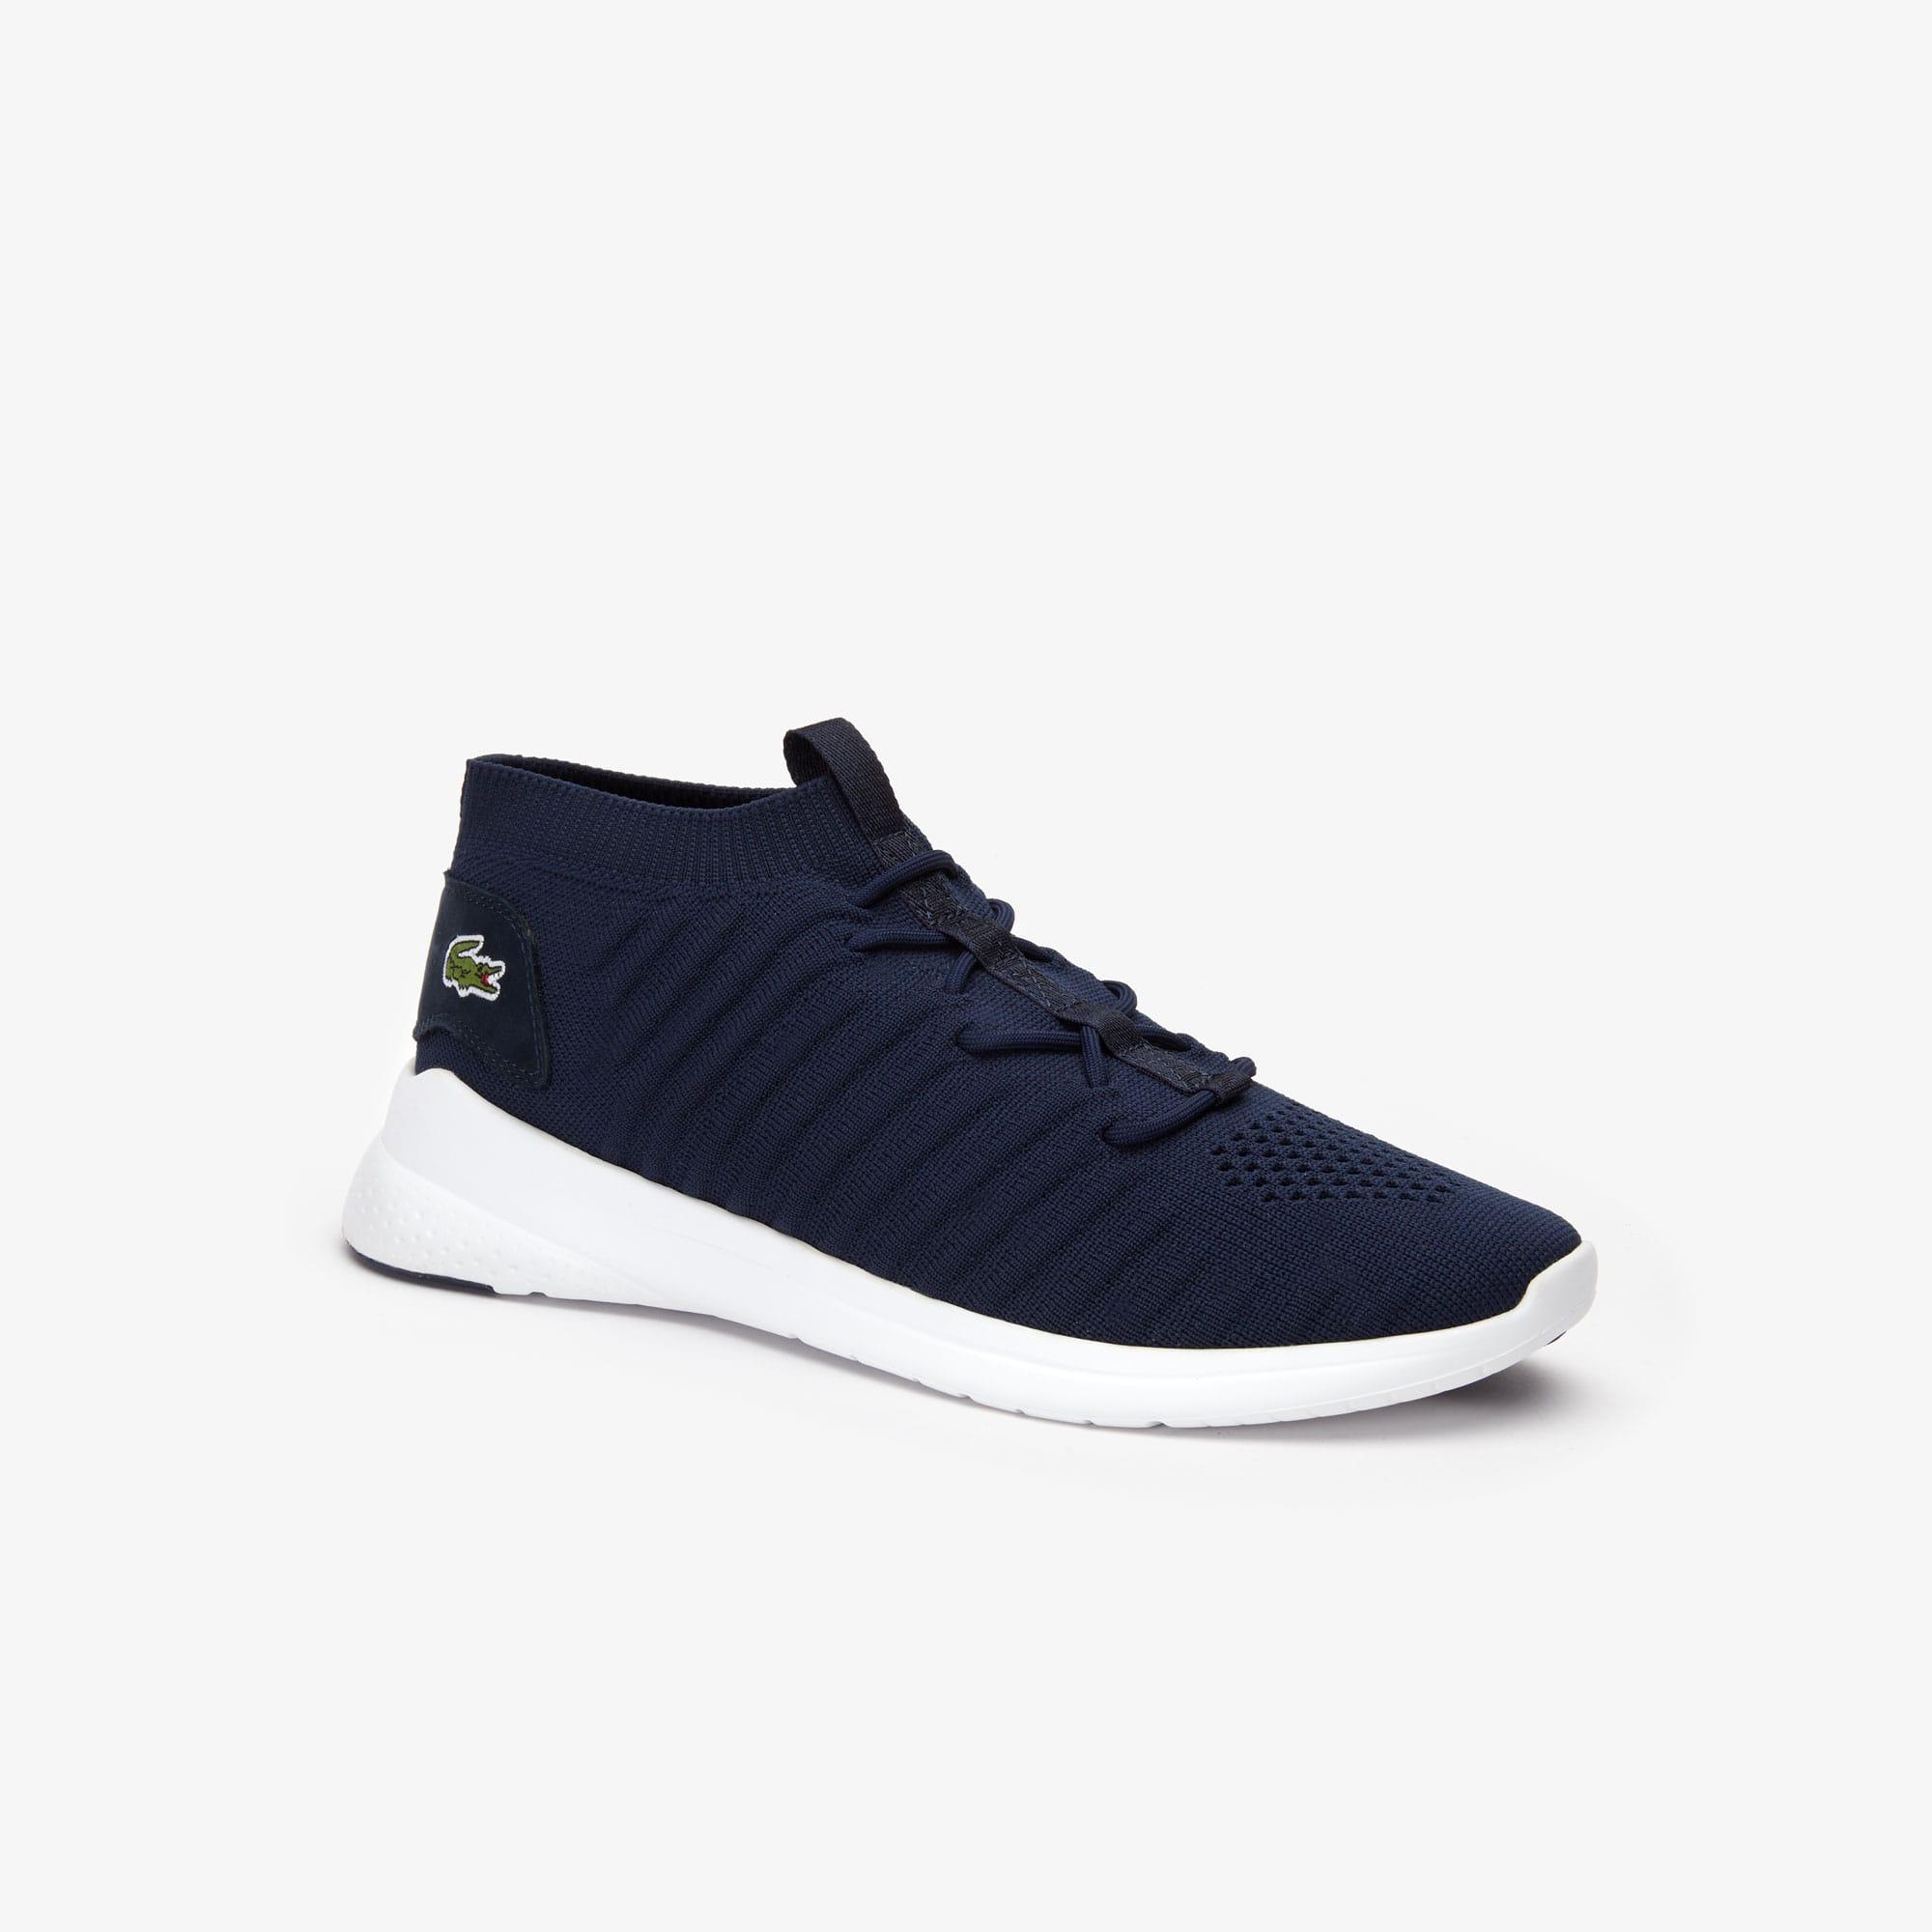 1b52e0331 All Shoes   LACOSTE